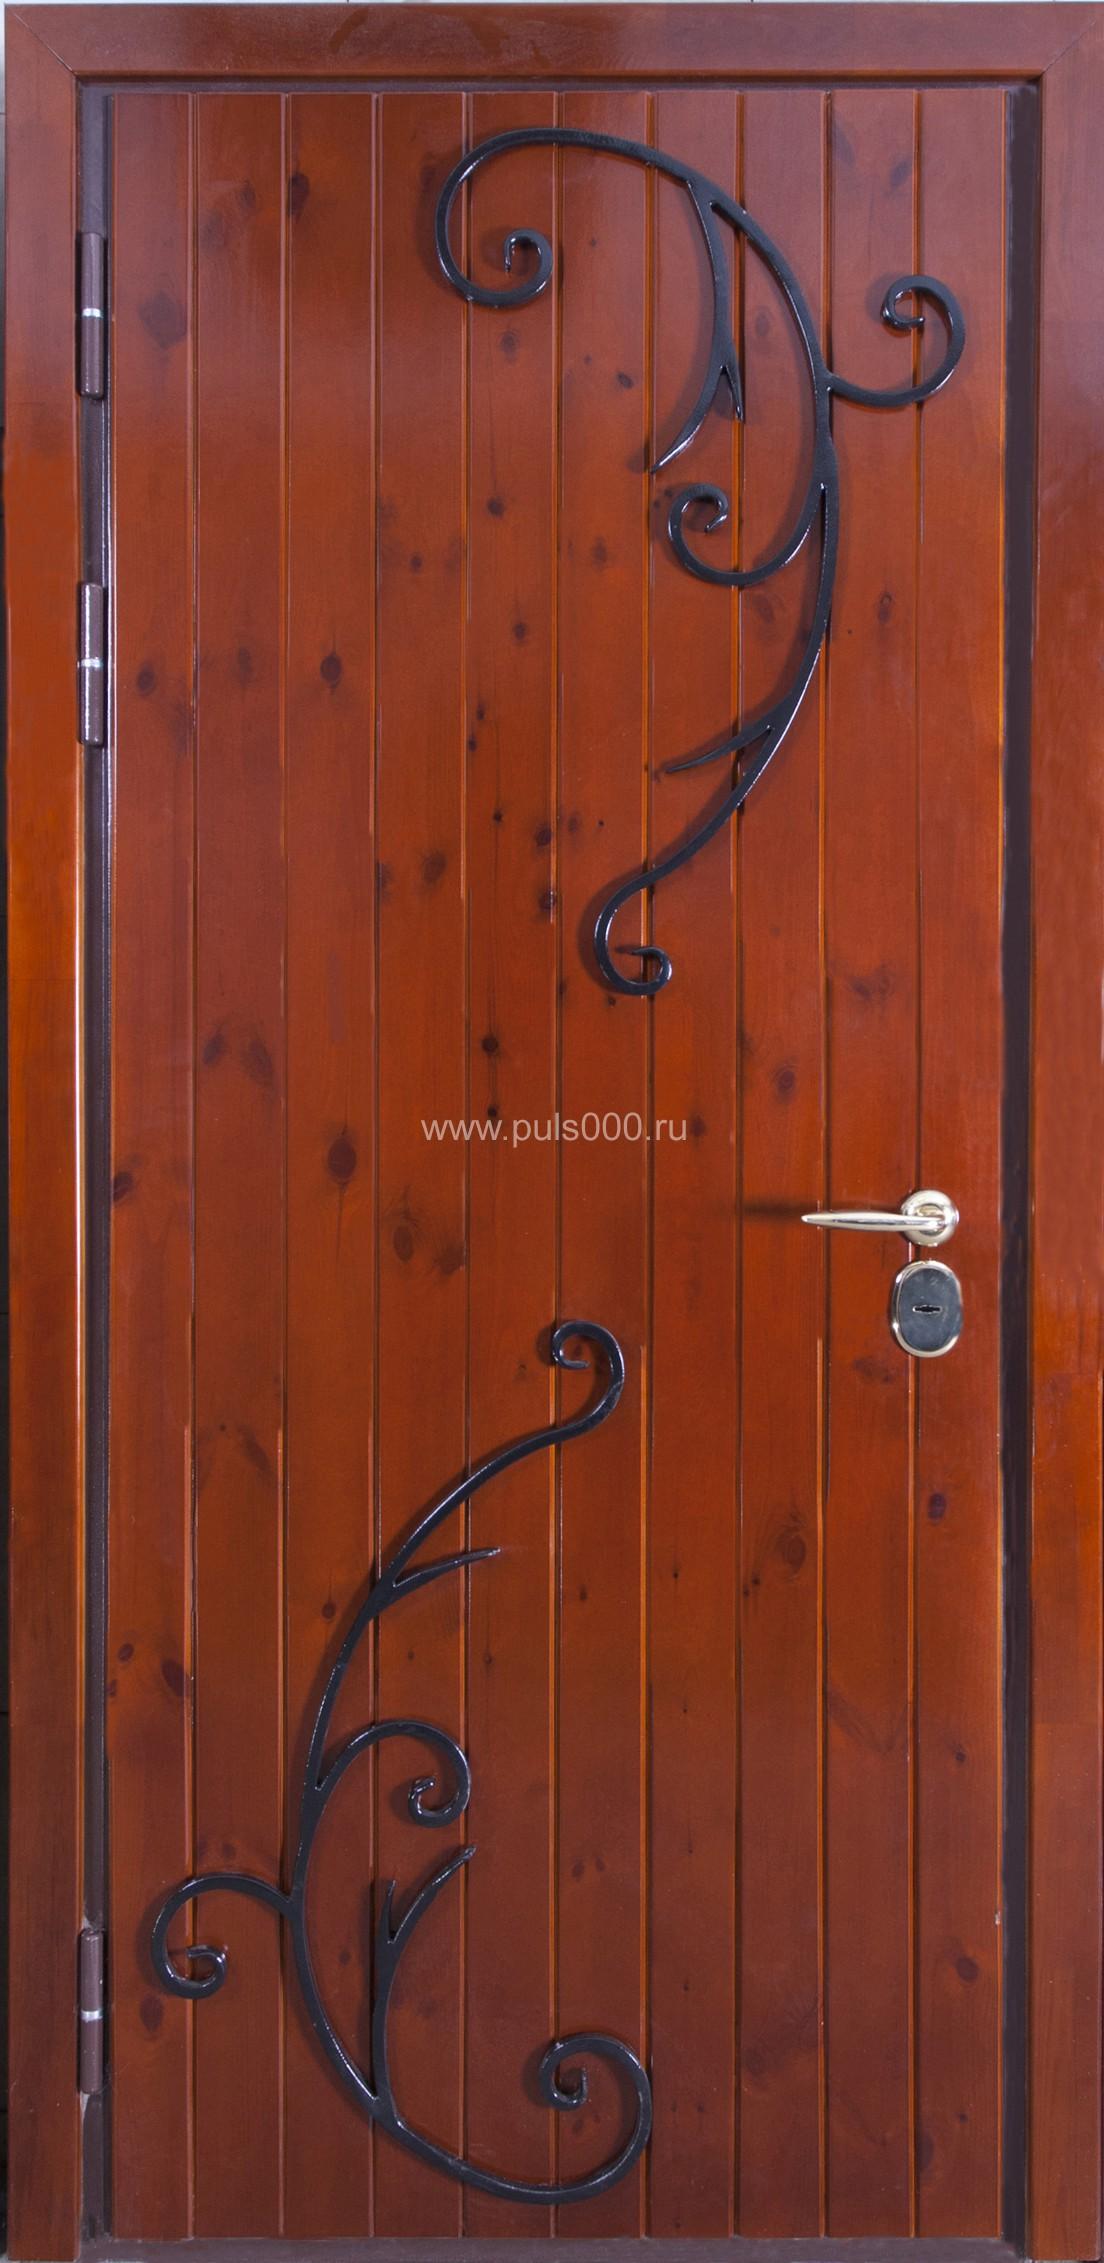 железные двери обиты деревом